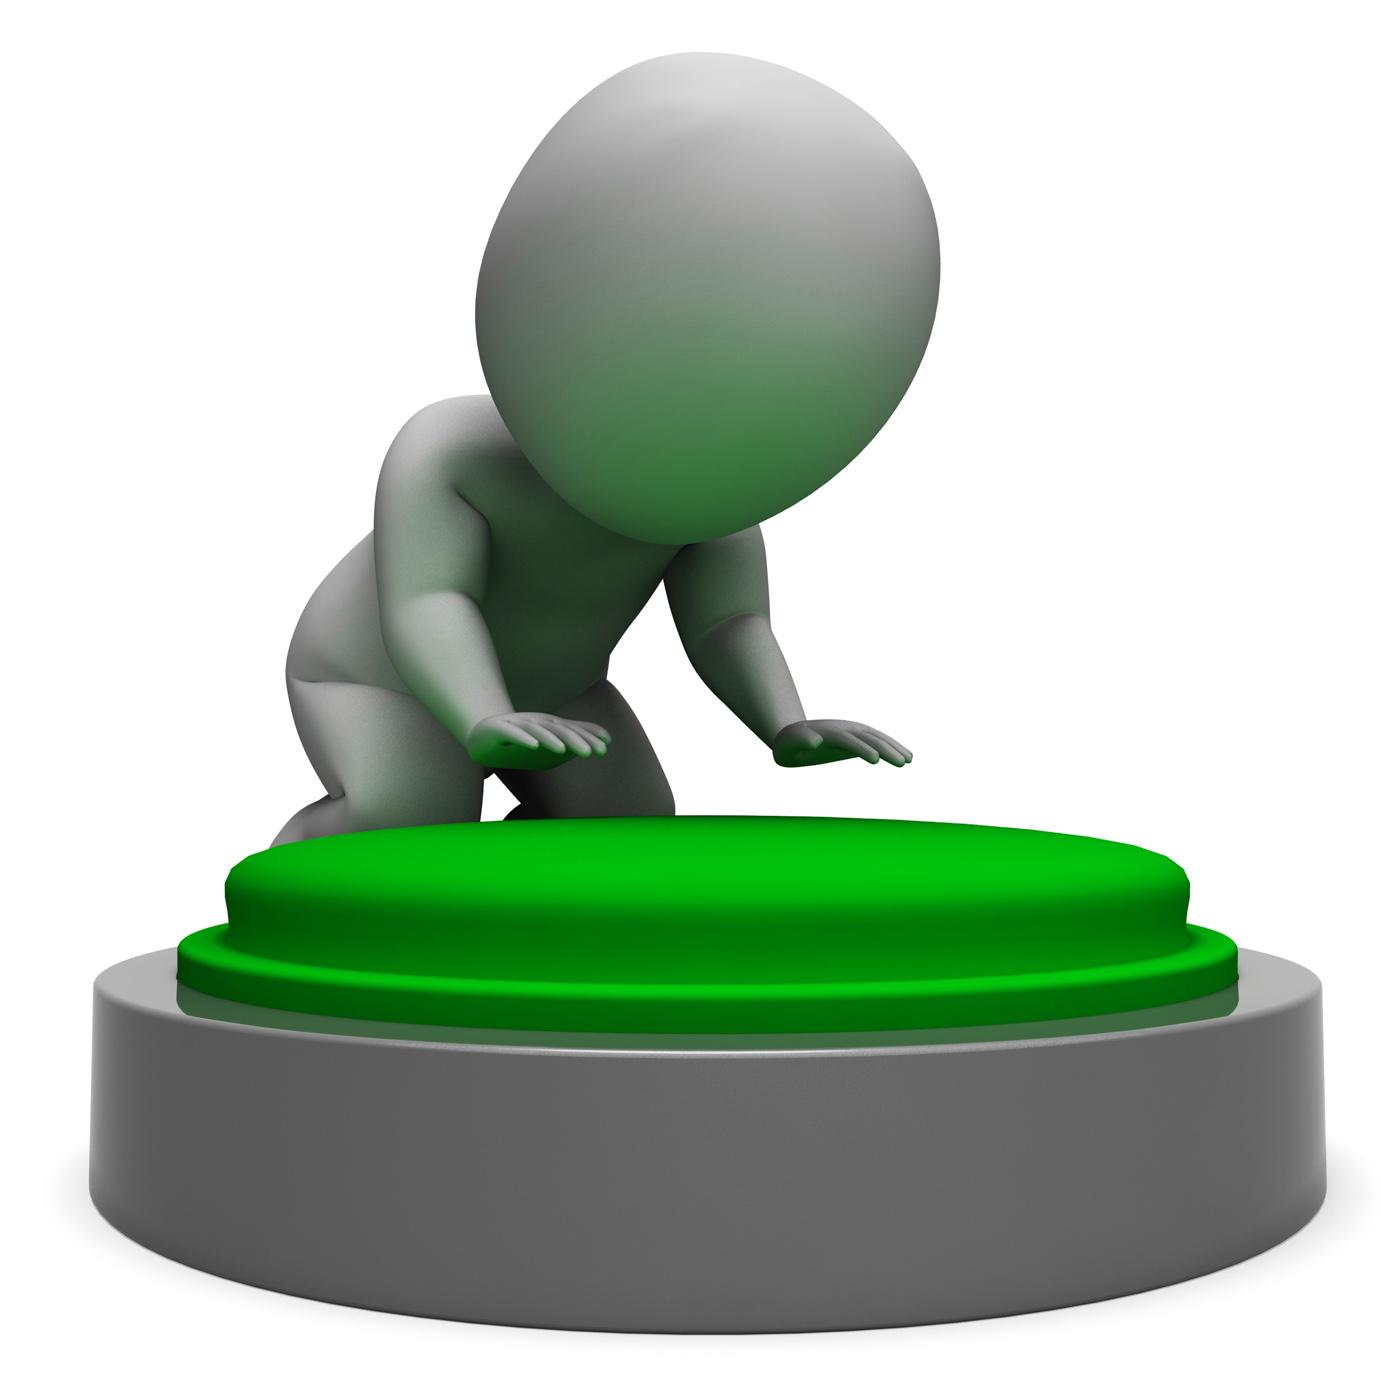 Pushing green button showing start photo